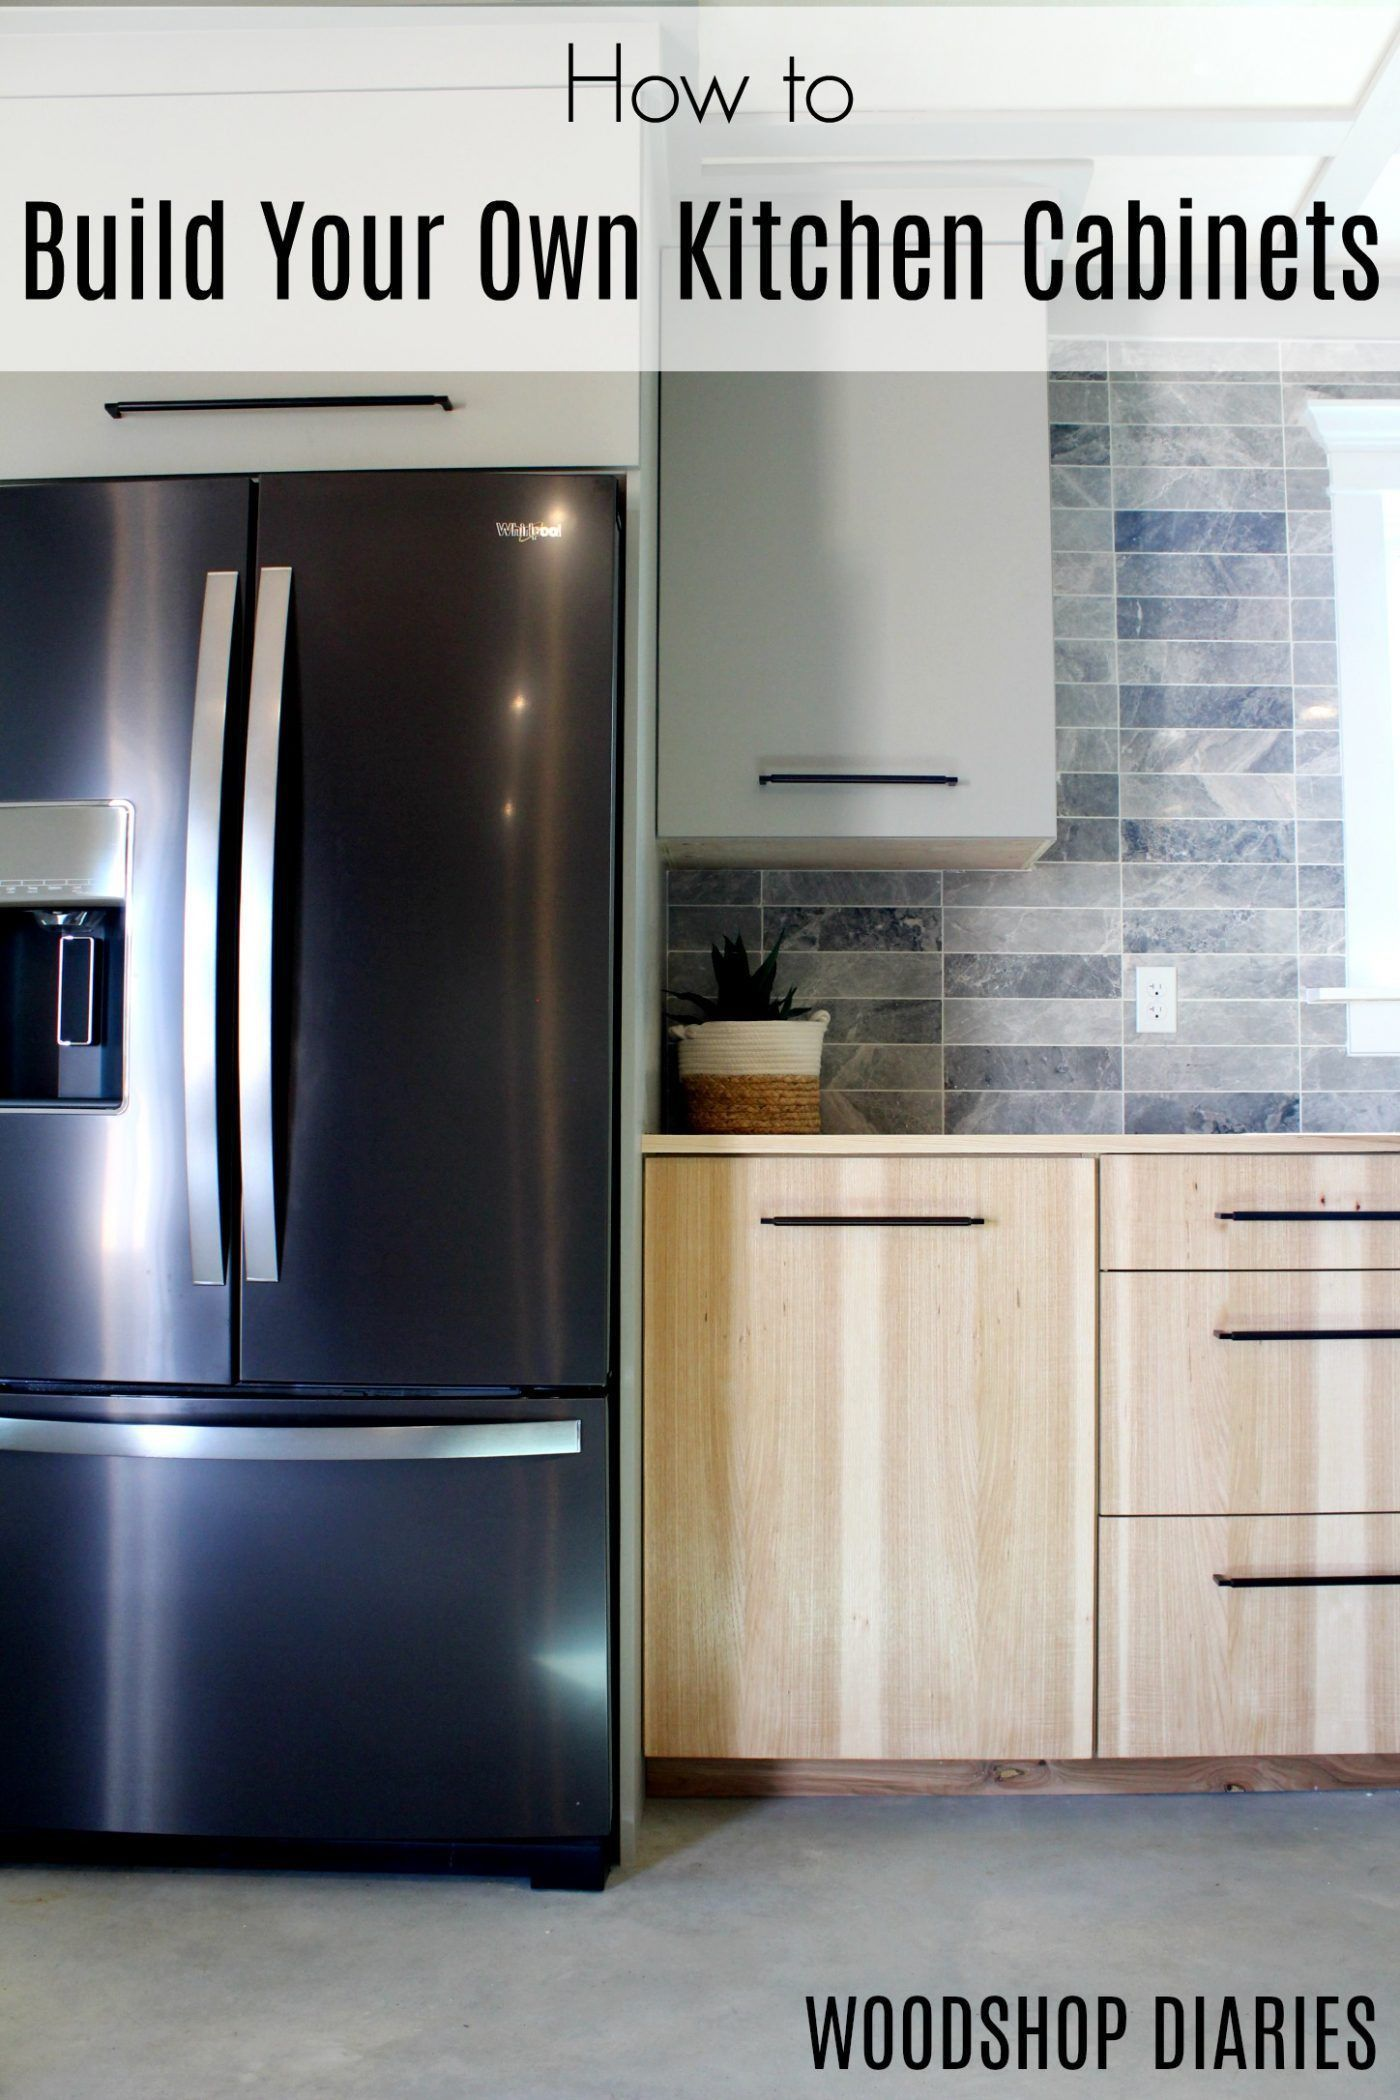 Kitchen Cabinets Doors Only 2021 In 2020 Diy Kitchen Cabinets Diy Kitchen Cabinets Build Diy Kitchen Renovation